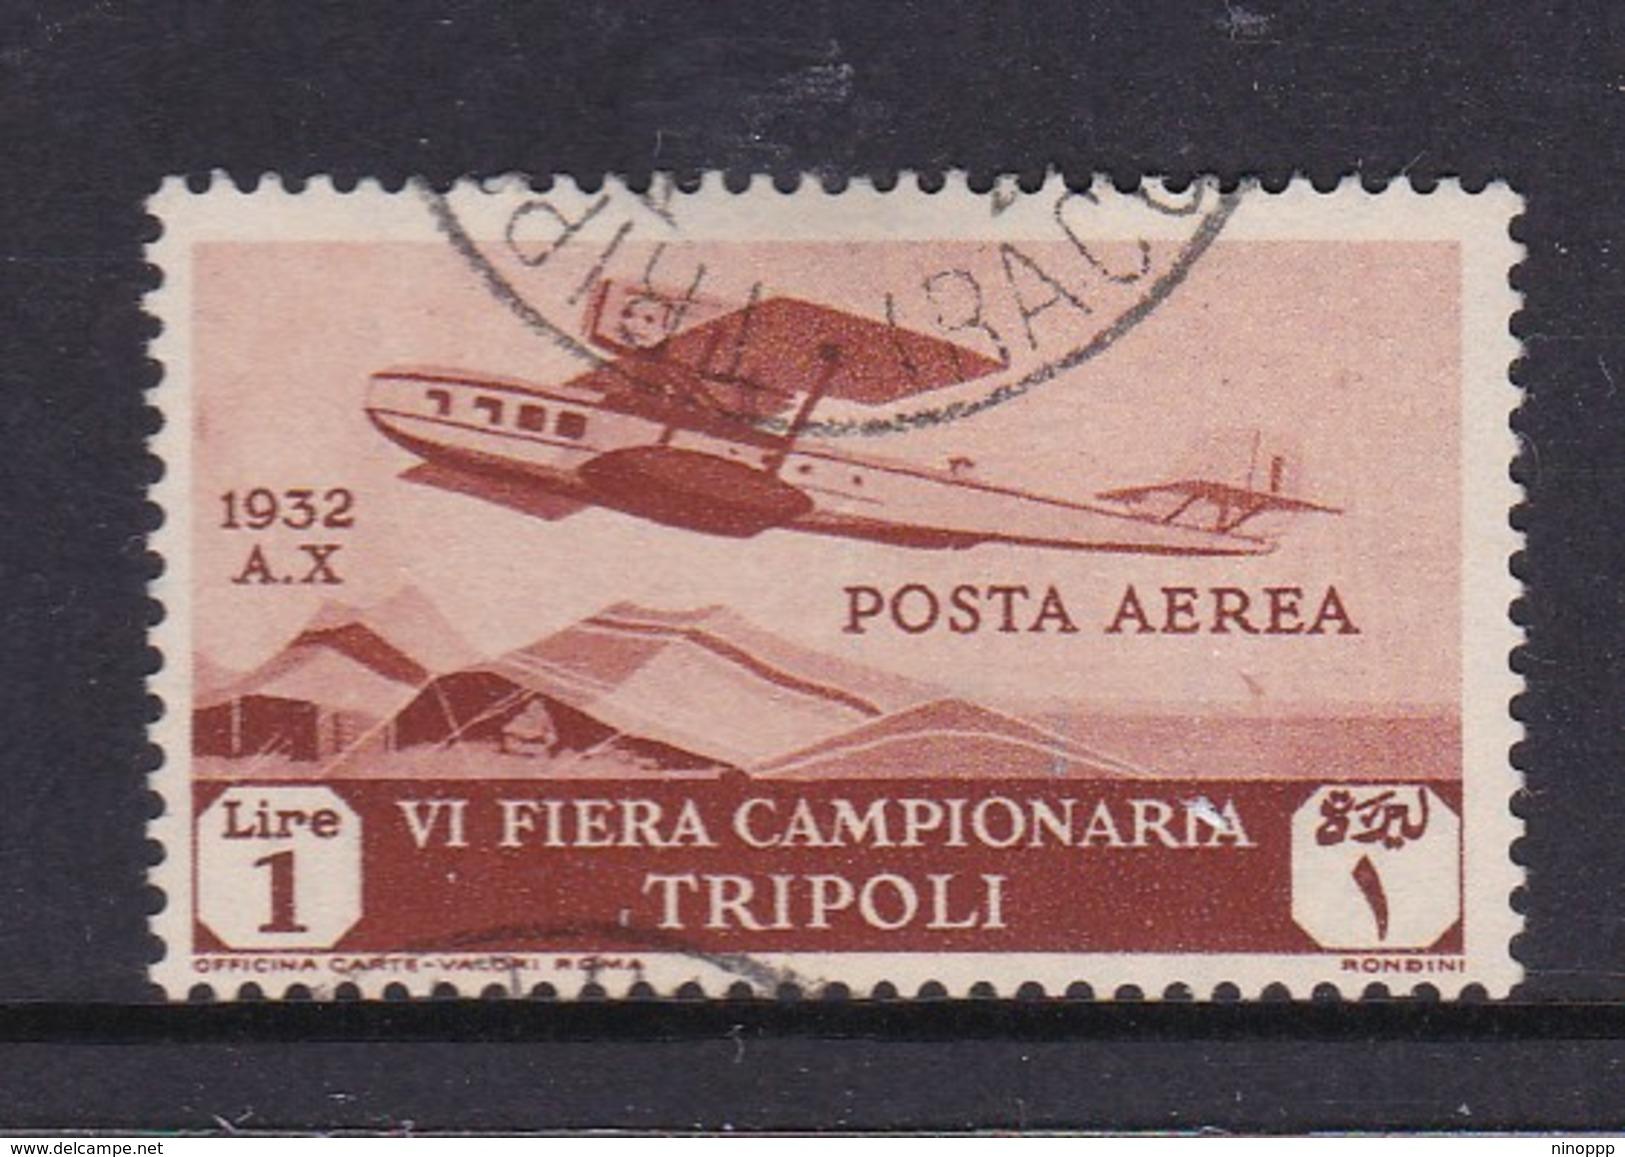 Italy-Colonies And Territories-Libya S AP5 1932 Sixth Sample Fair Tripoli,1 Lira Orange Brown,used - Libya